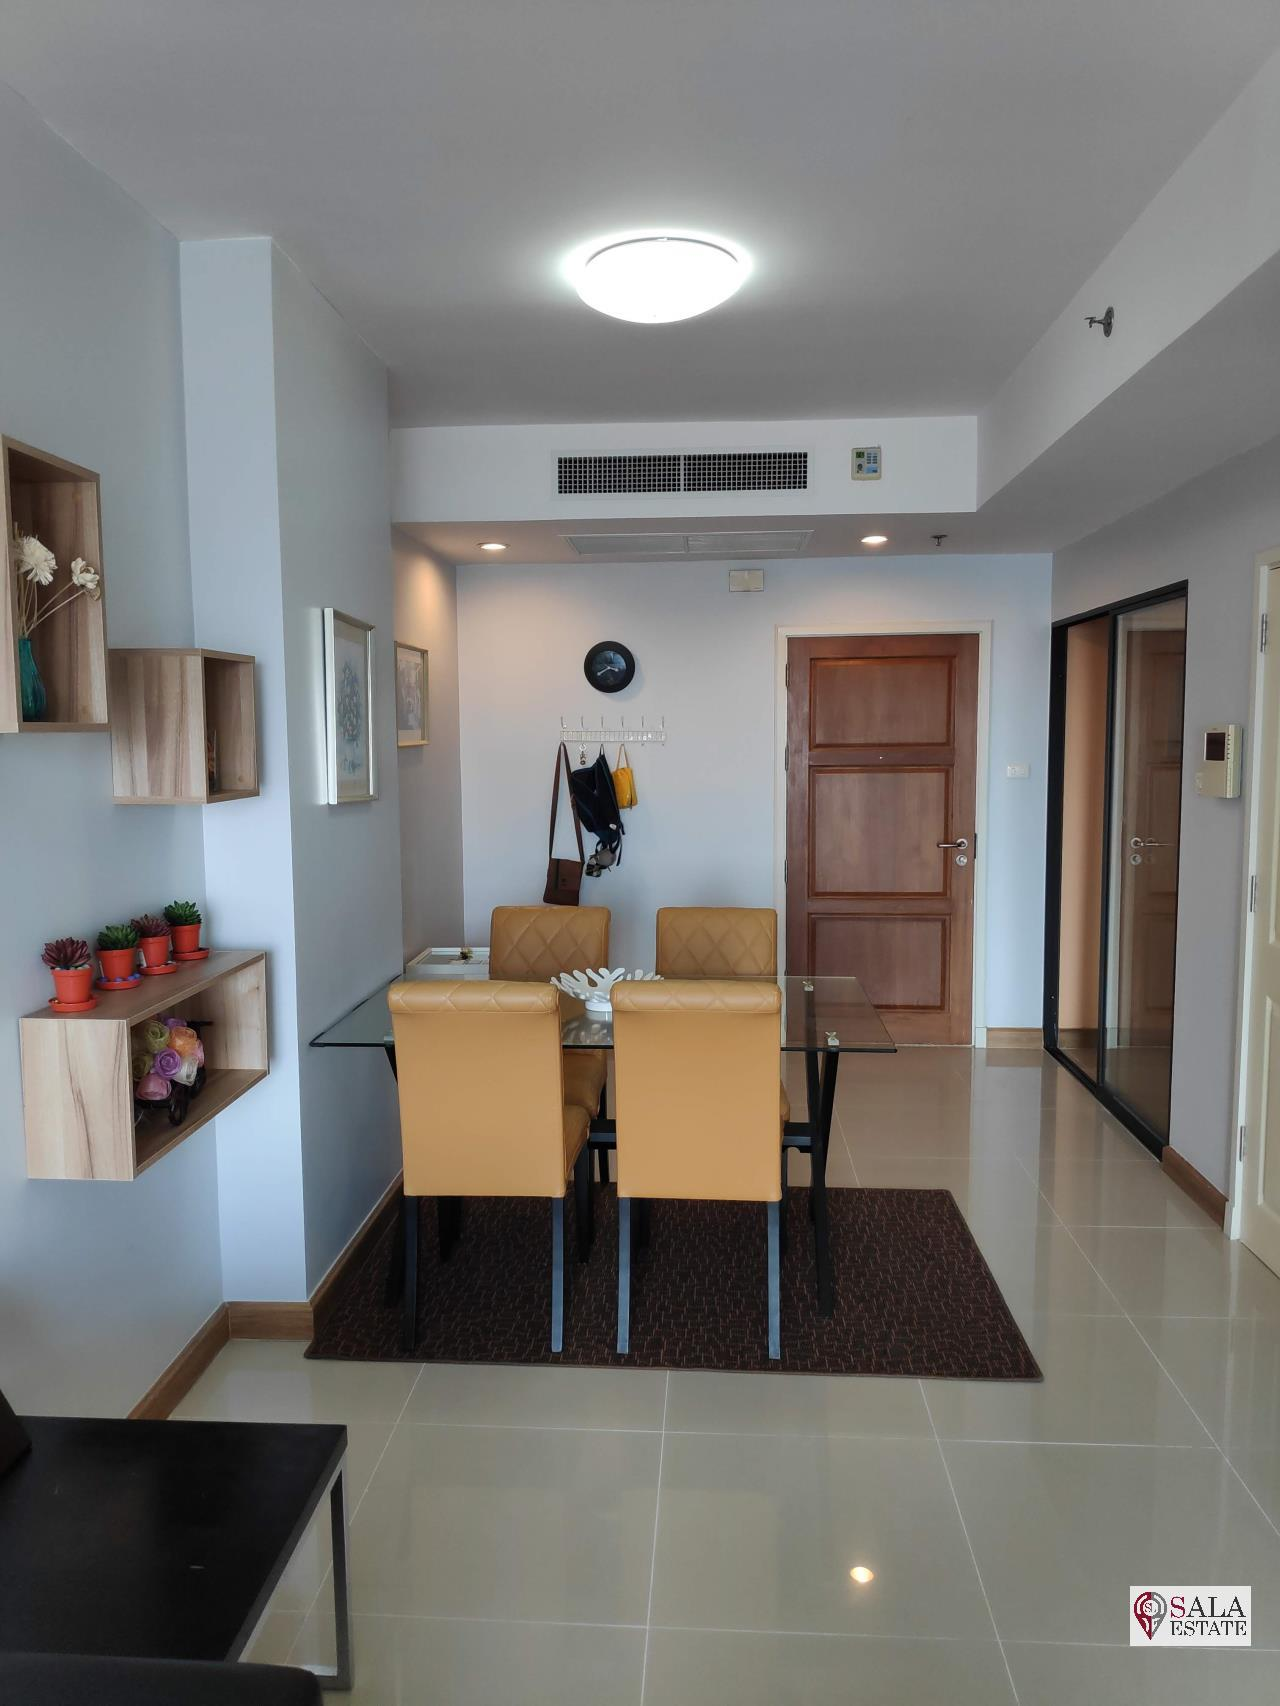 SALA ESTATE Agency's SUPALAI PREMIER NARATHIWAS – BTS CHONG NONSI, 1 BEDROOM 1 BATHROOM, FULLY FERNISHED, CITY VIEW 8